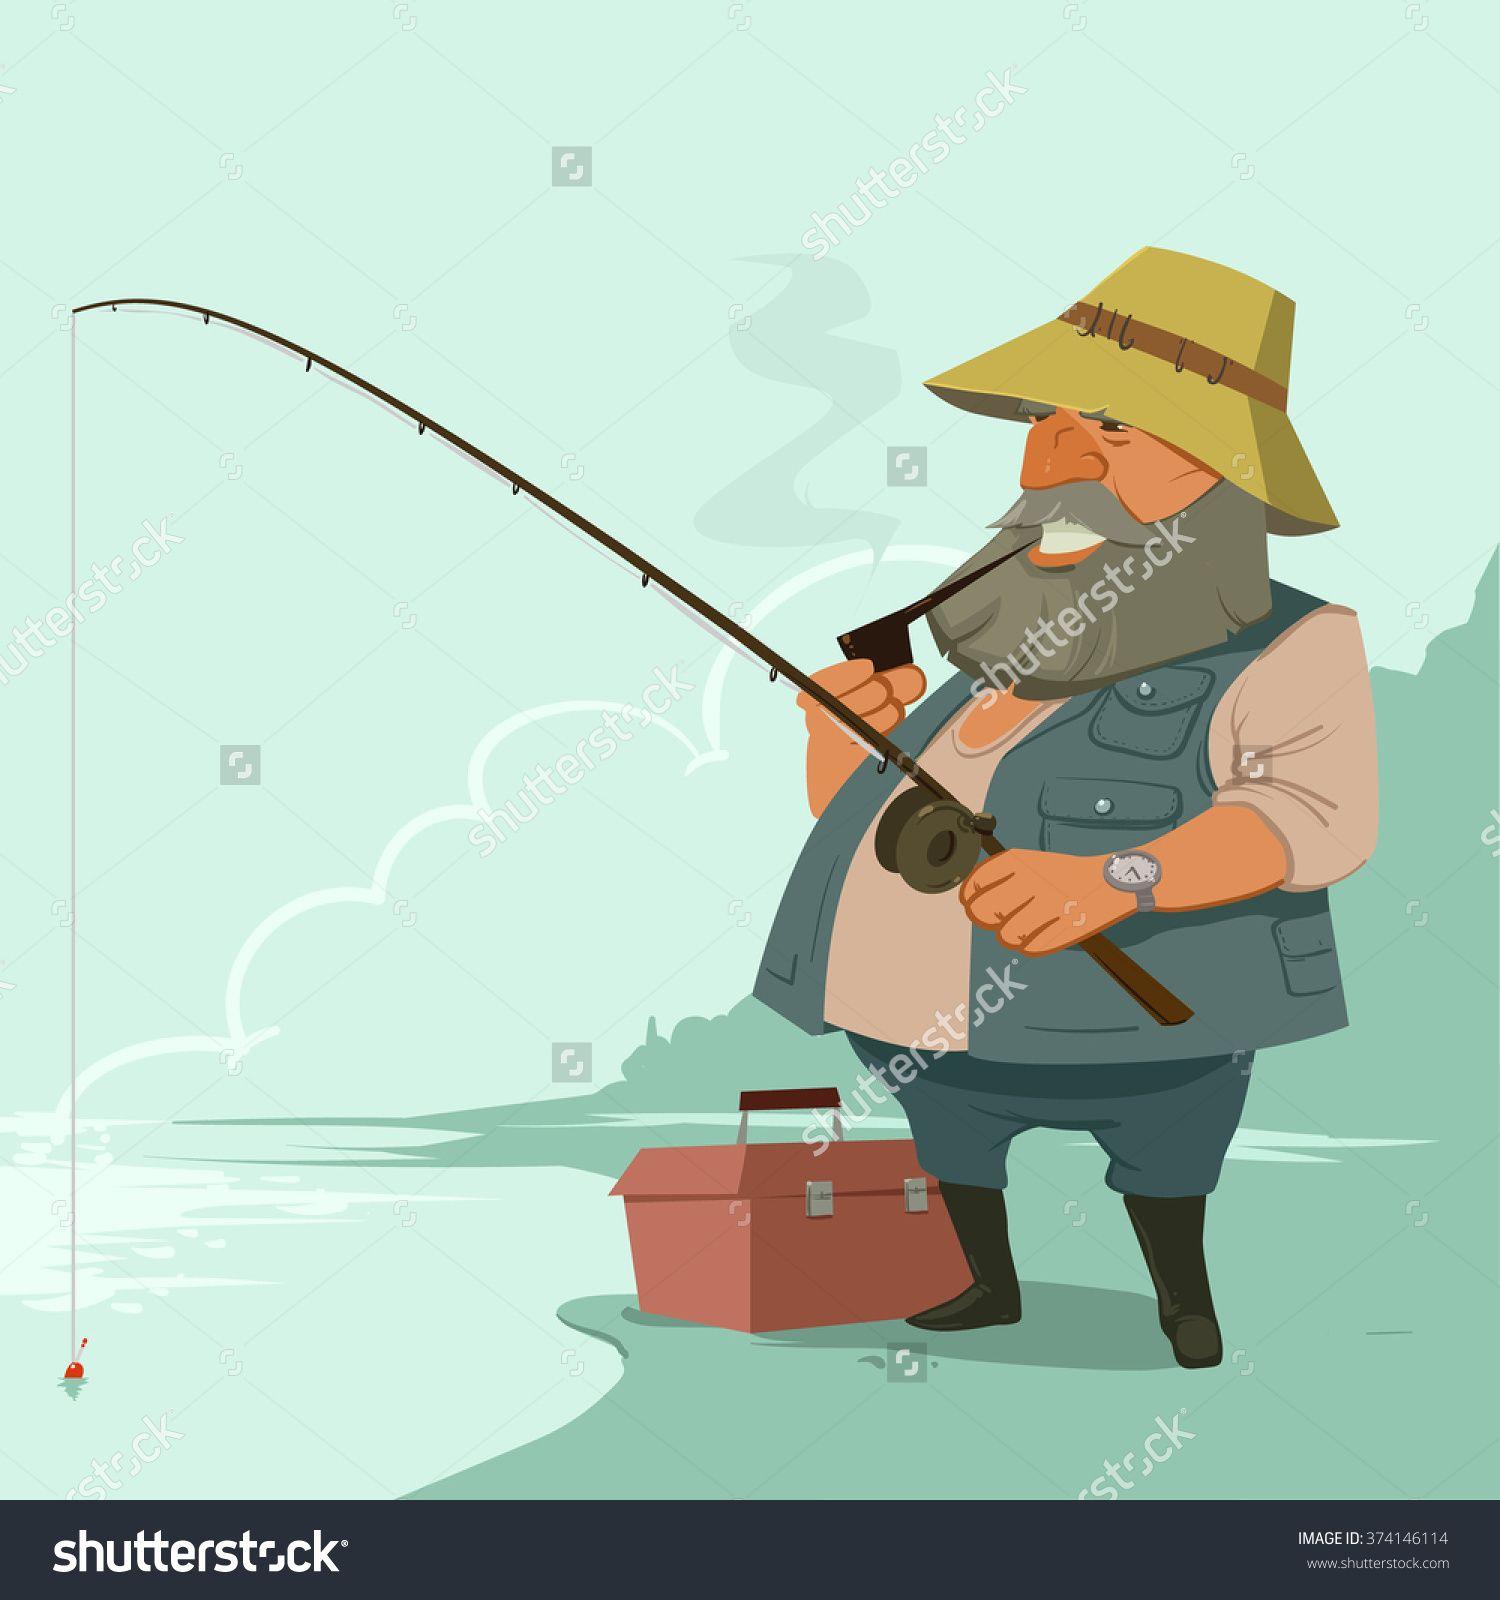 Fisherman With Fishing Rod, Fishing Equipment, Cartoon